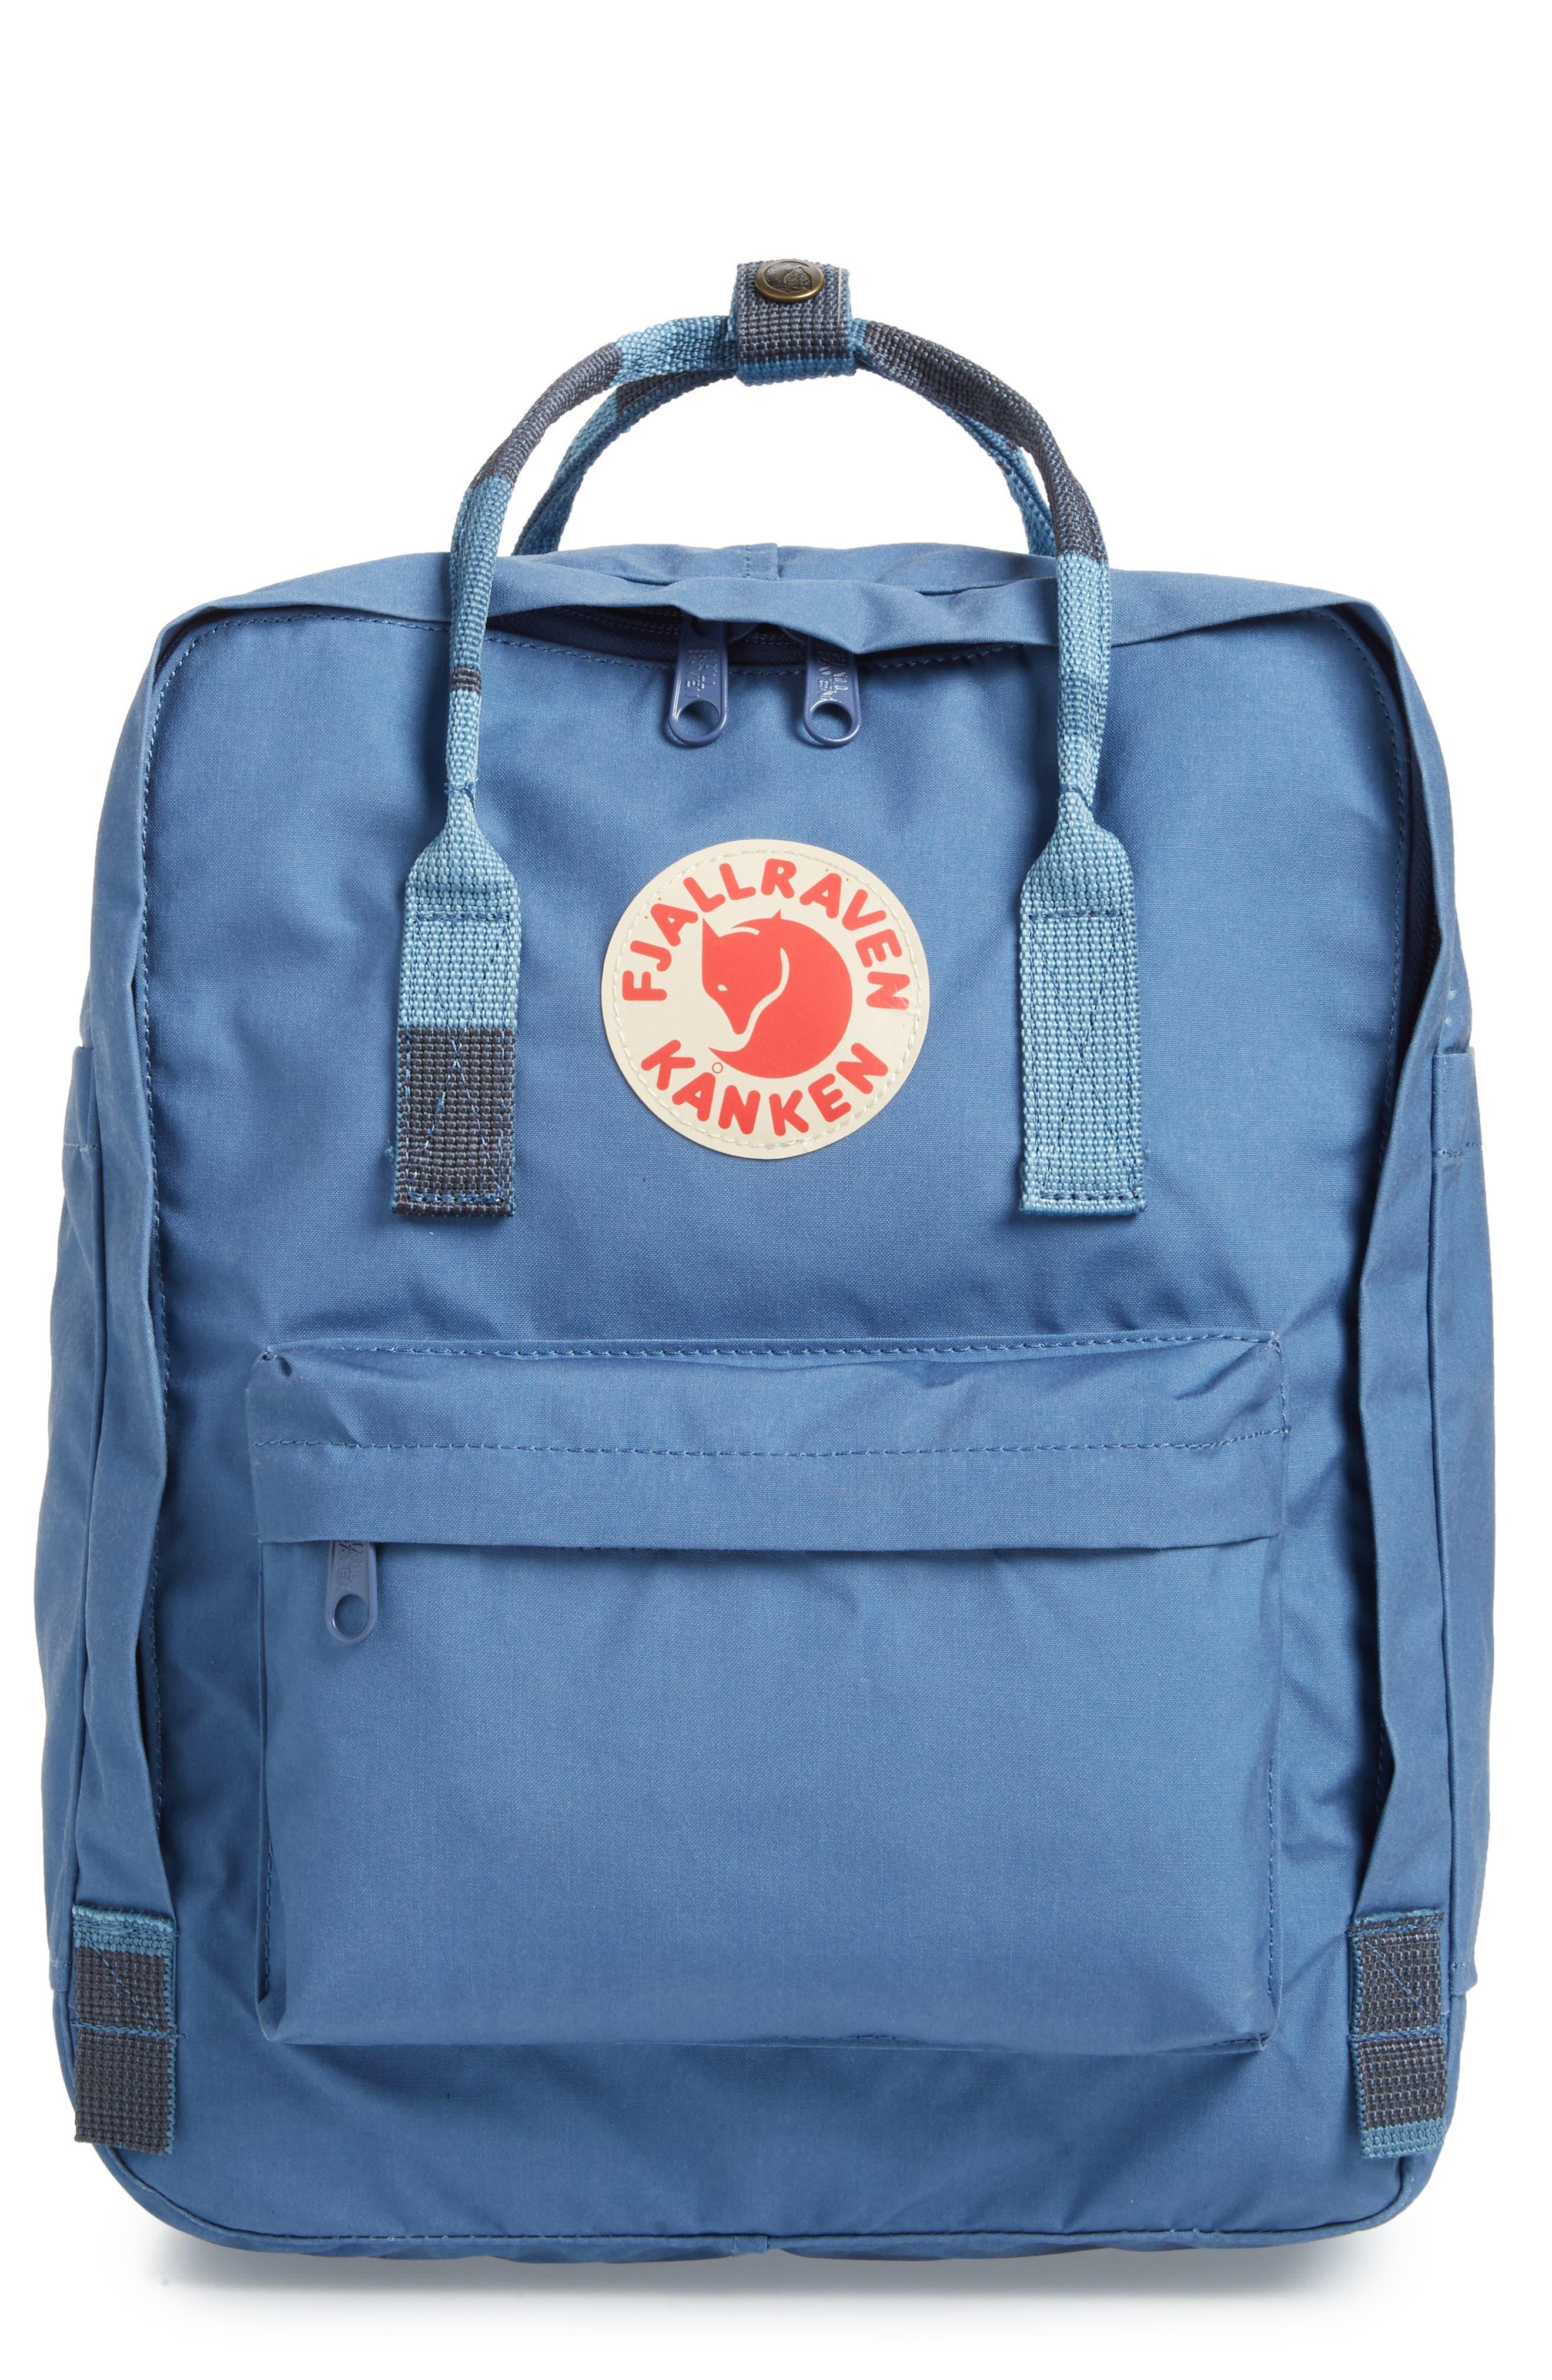 'Kånken' Water Resistant Backpack,                             Main thumbnail 1, color,                             Blue Ridge/ Random Blocked